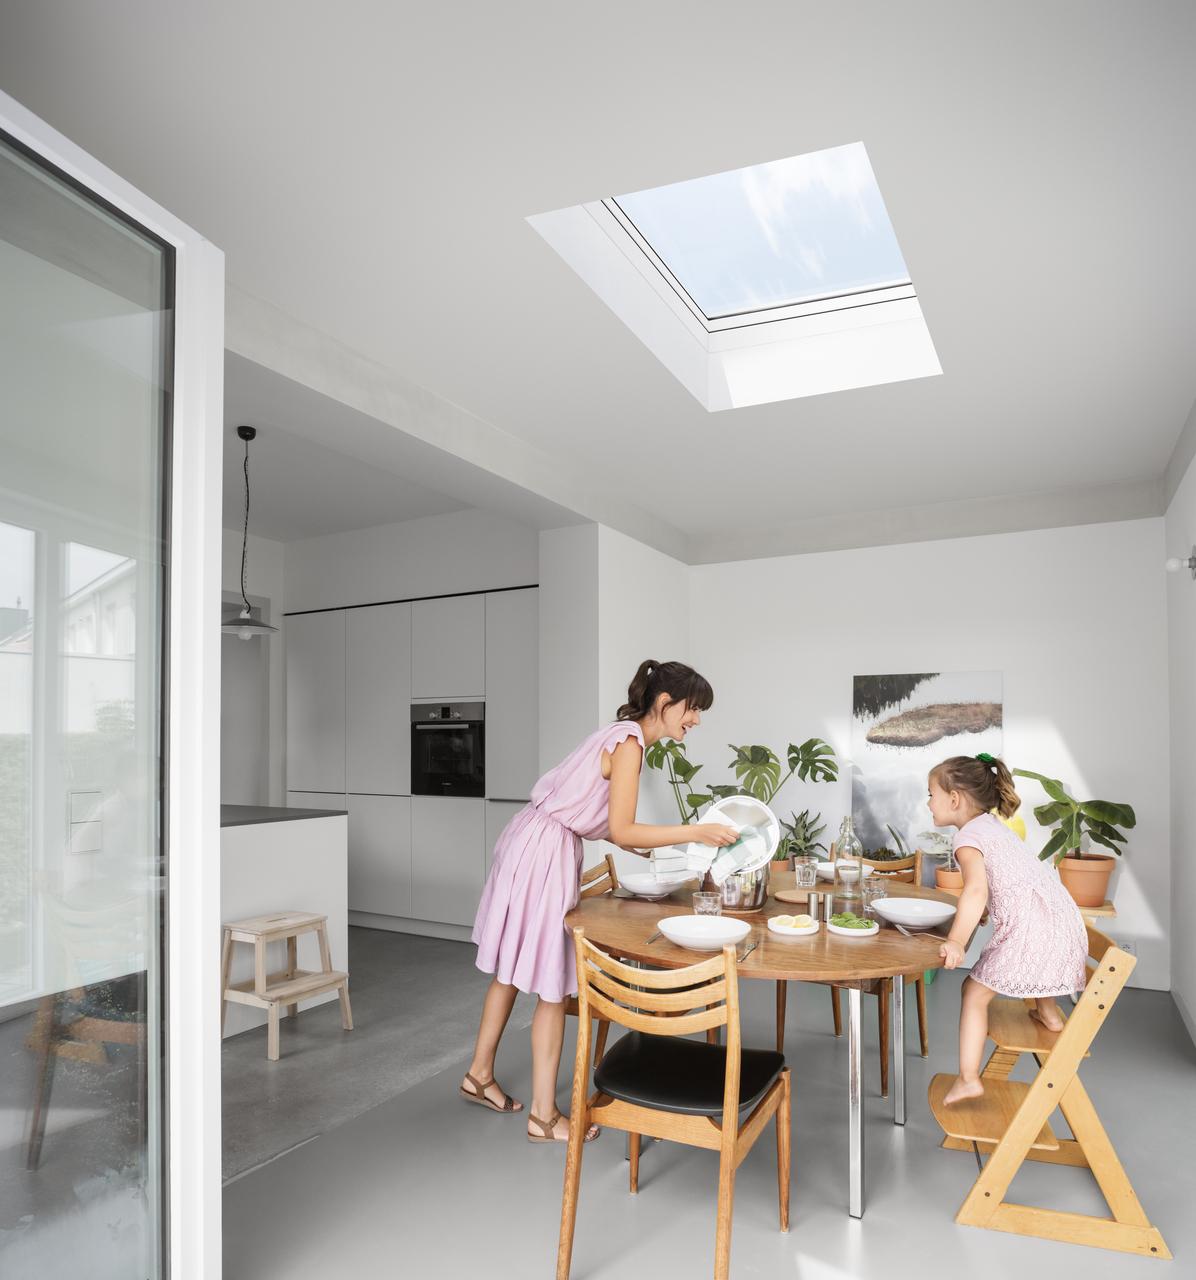 Flachdach fenster konvex glas for Finestre a soffitto